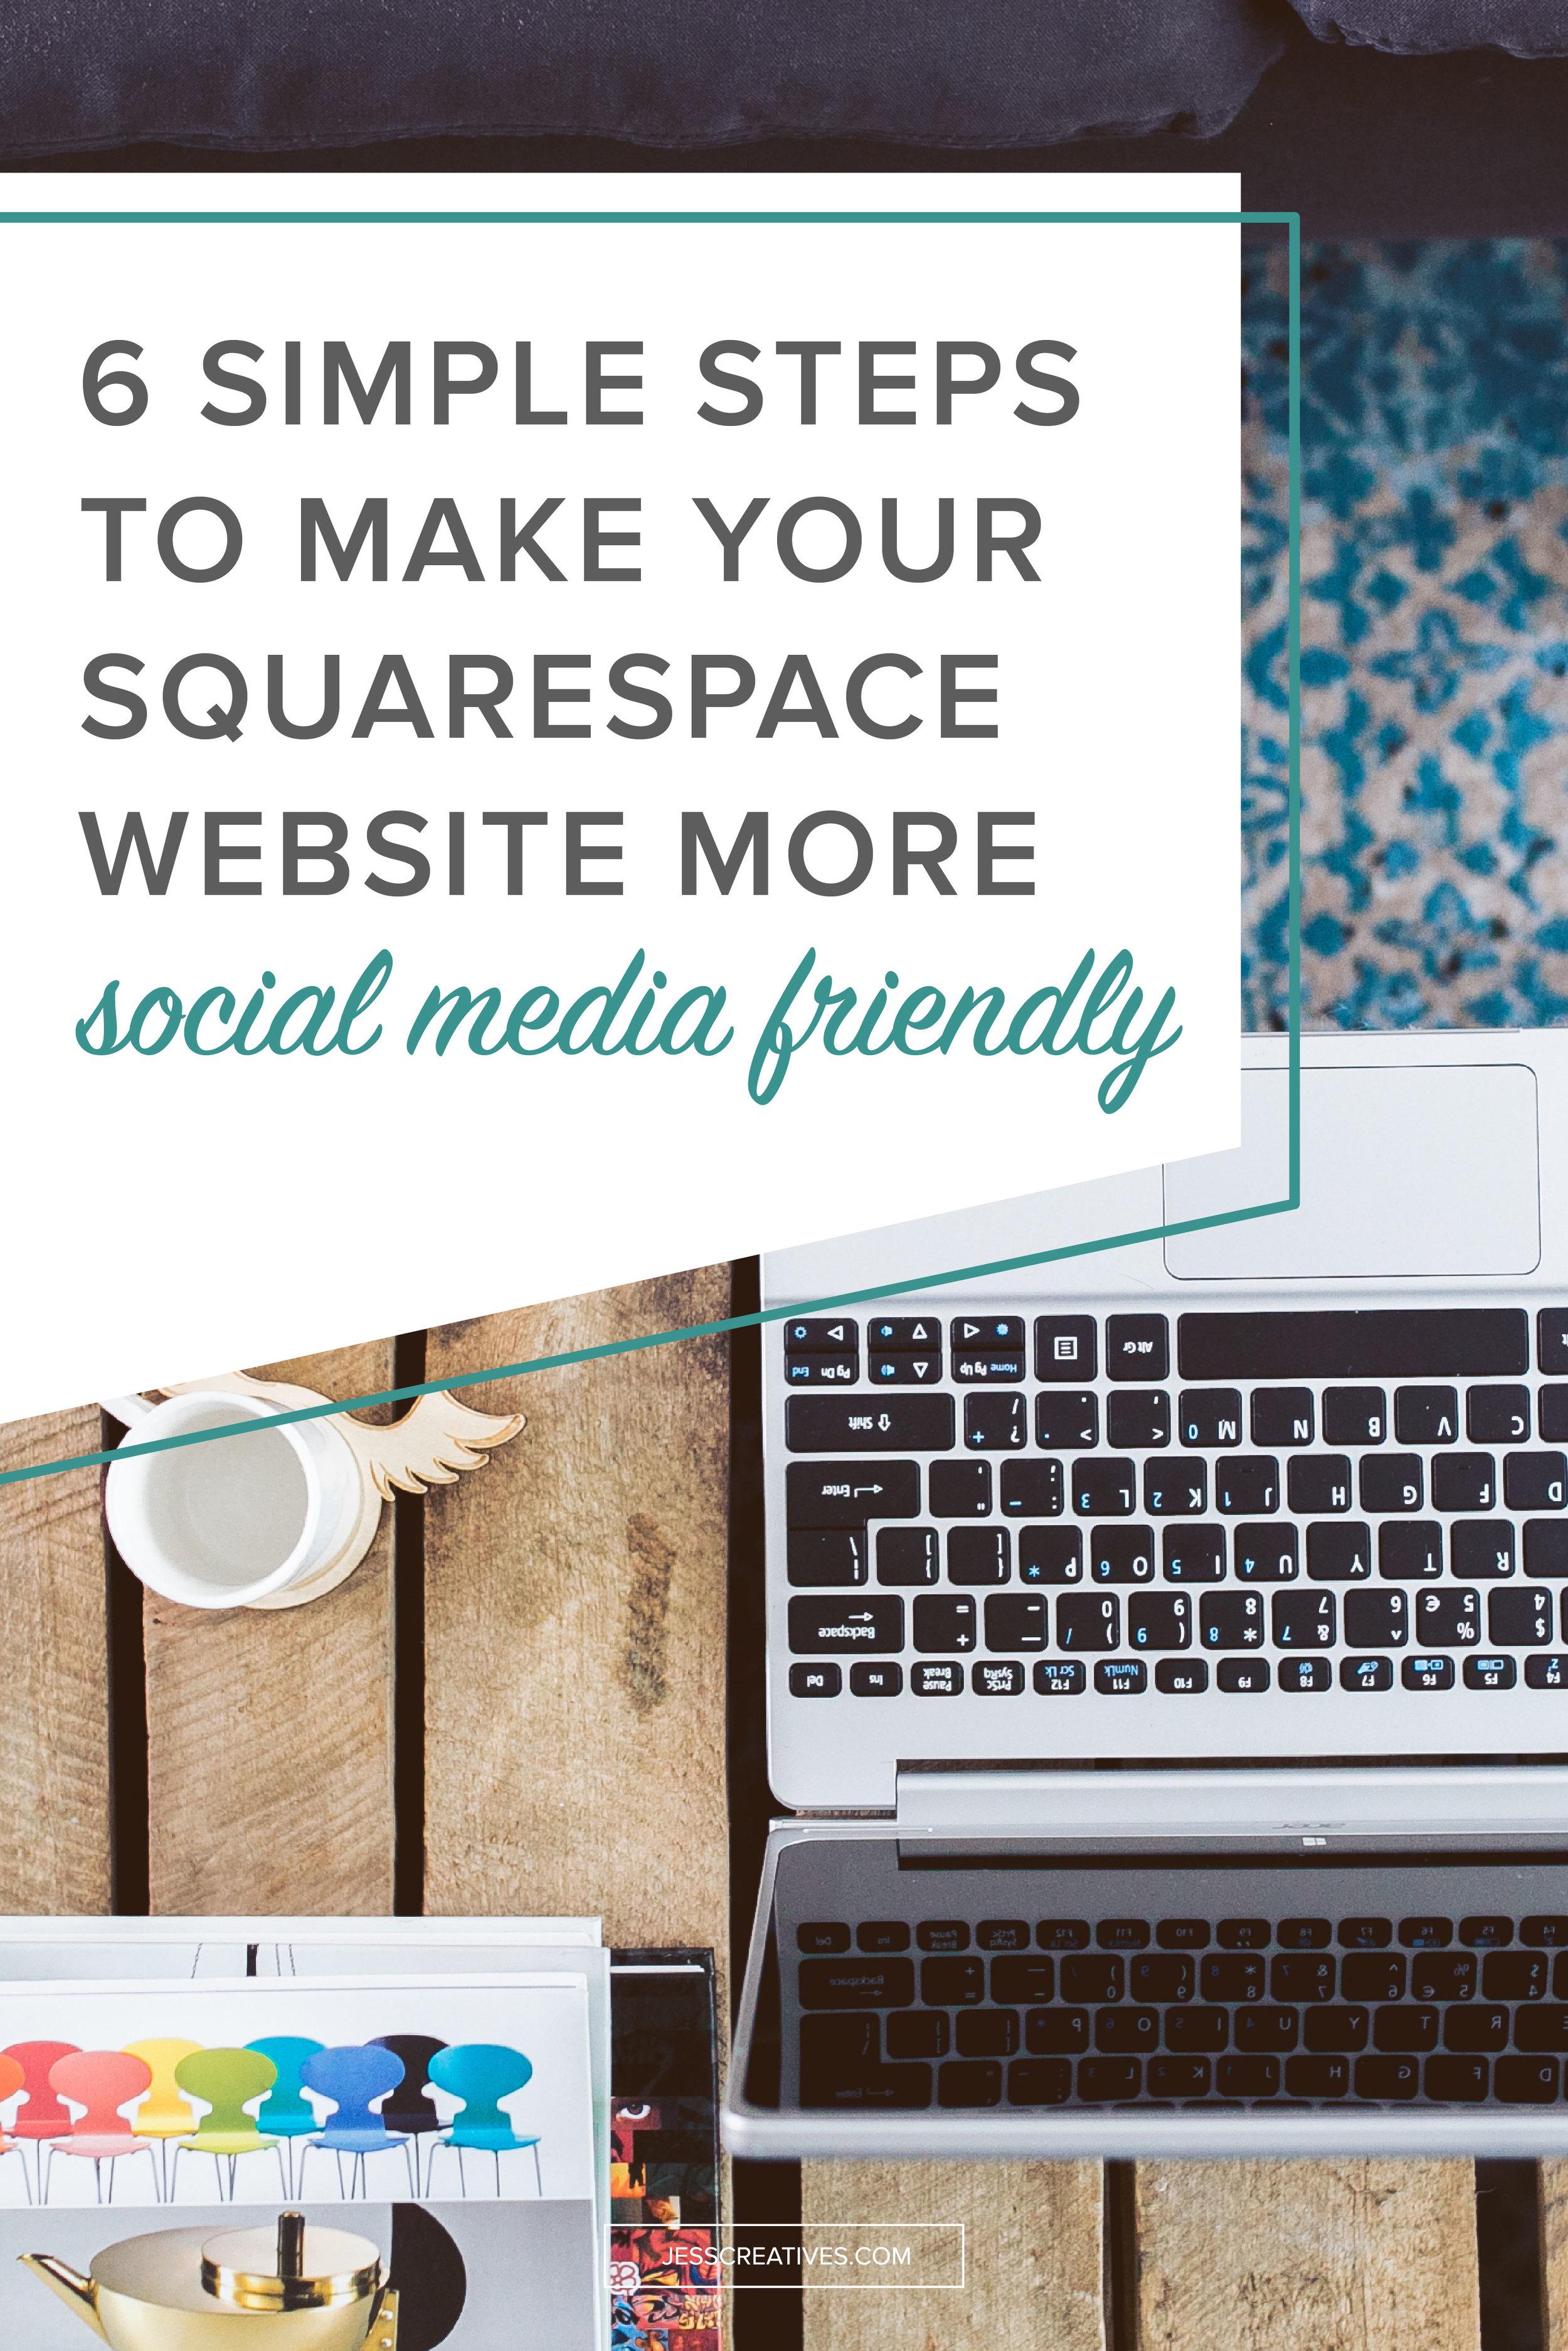 List of image-sharing websites